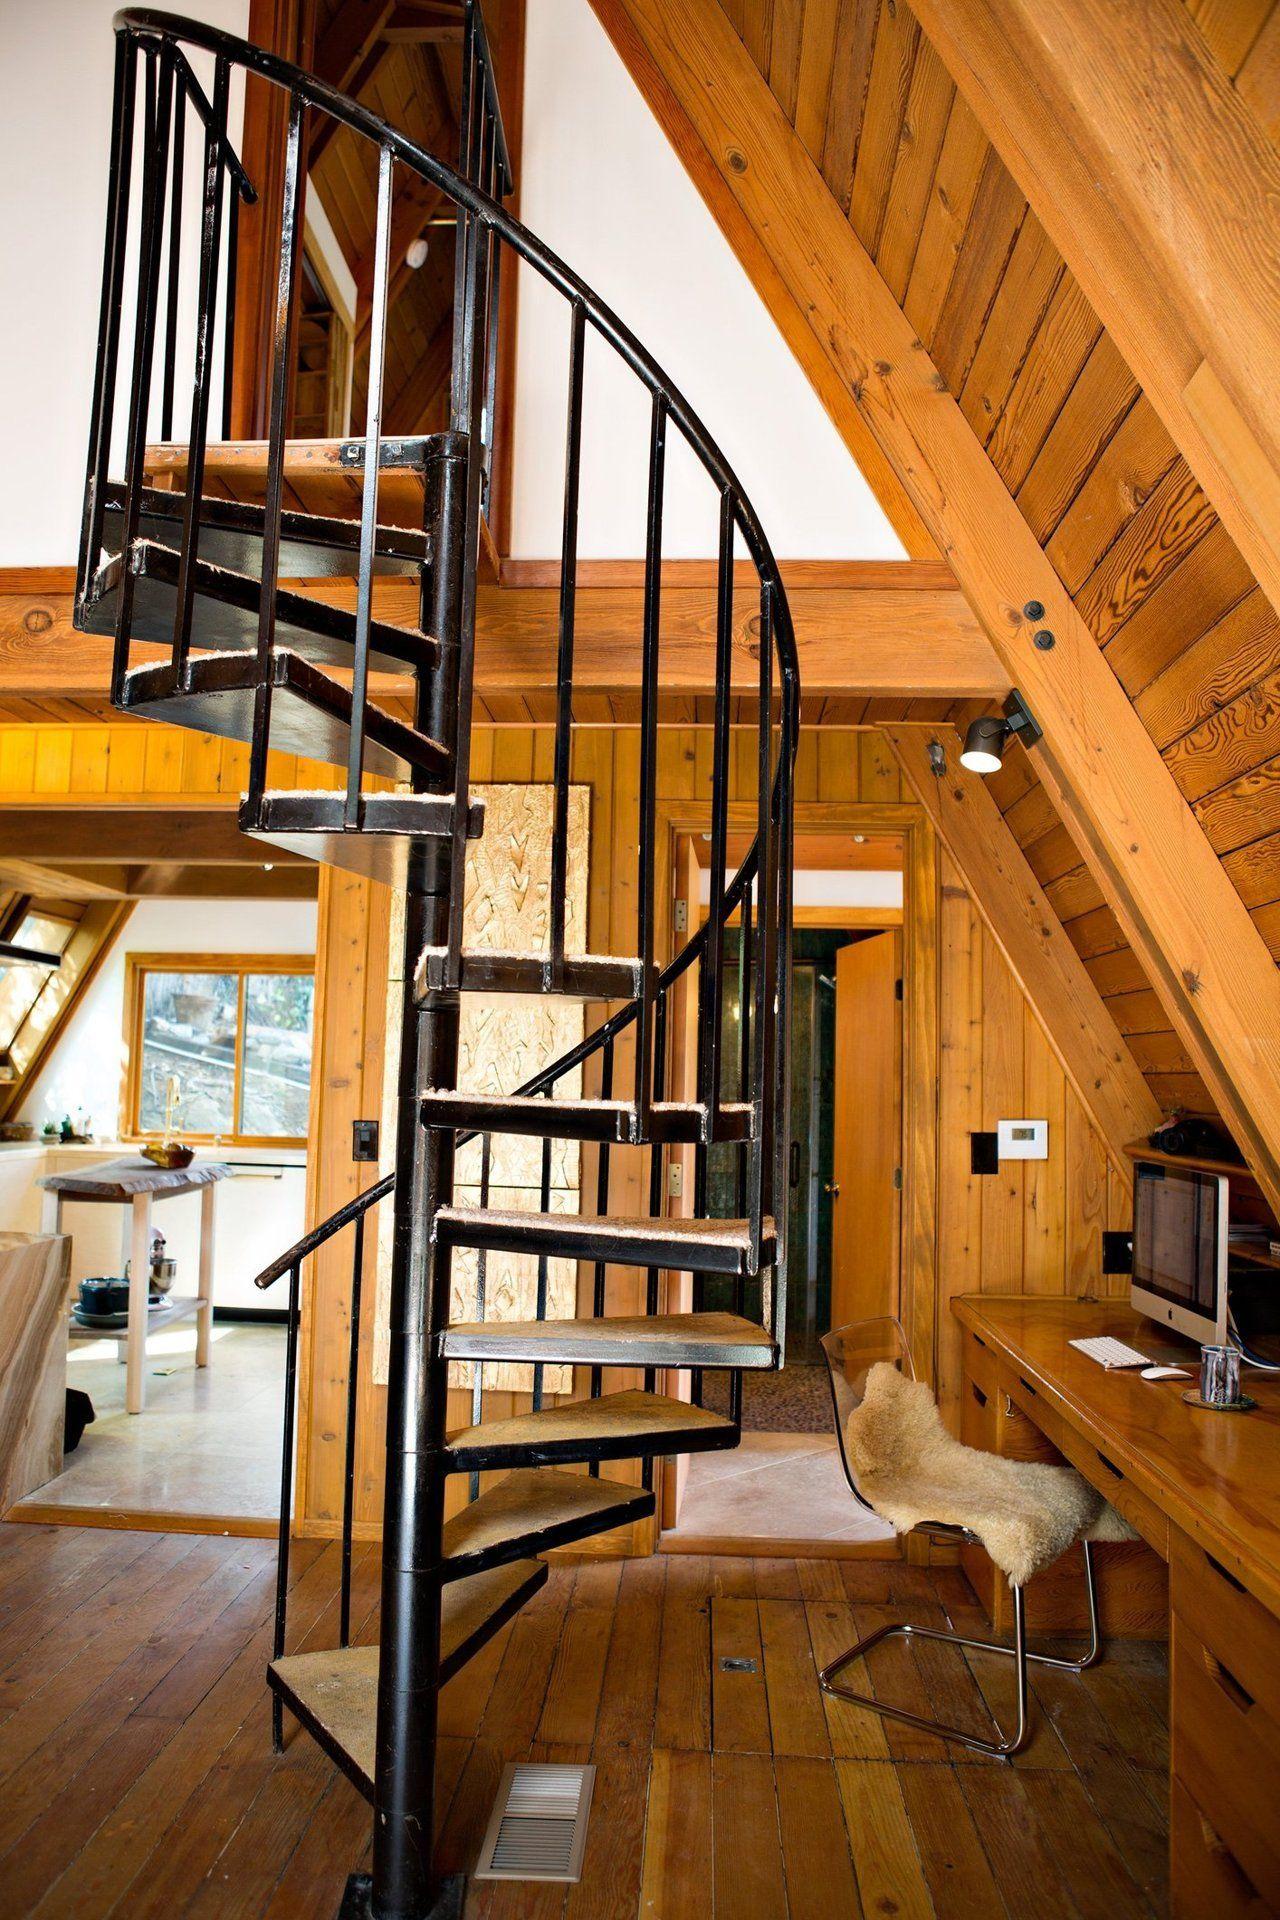 home interior design stairs%0A Chalet interior